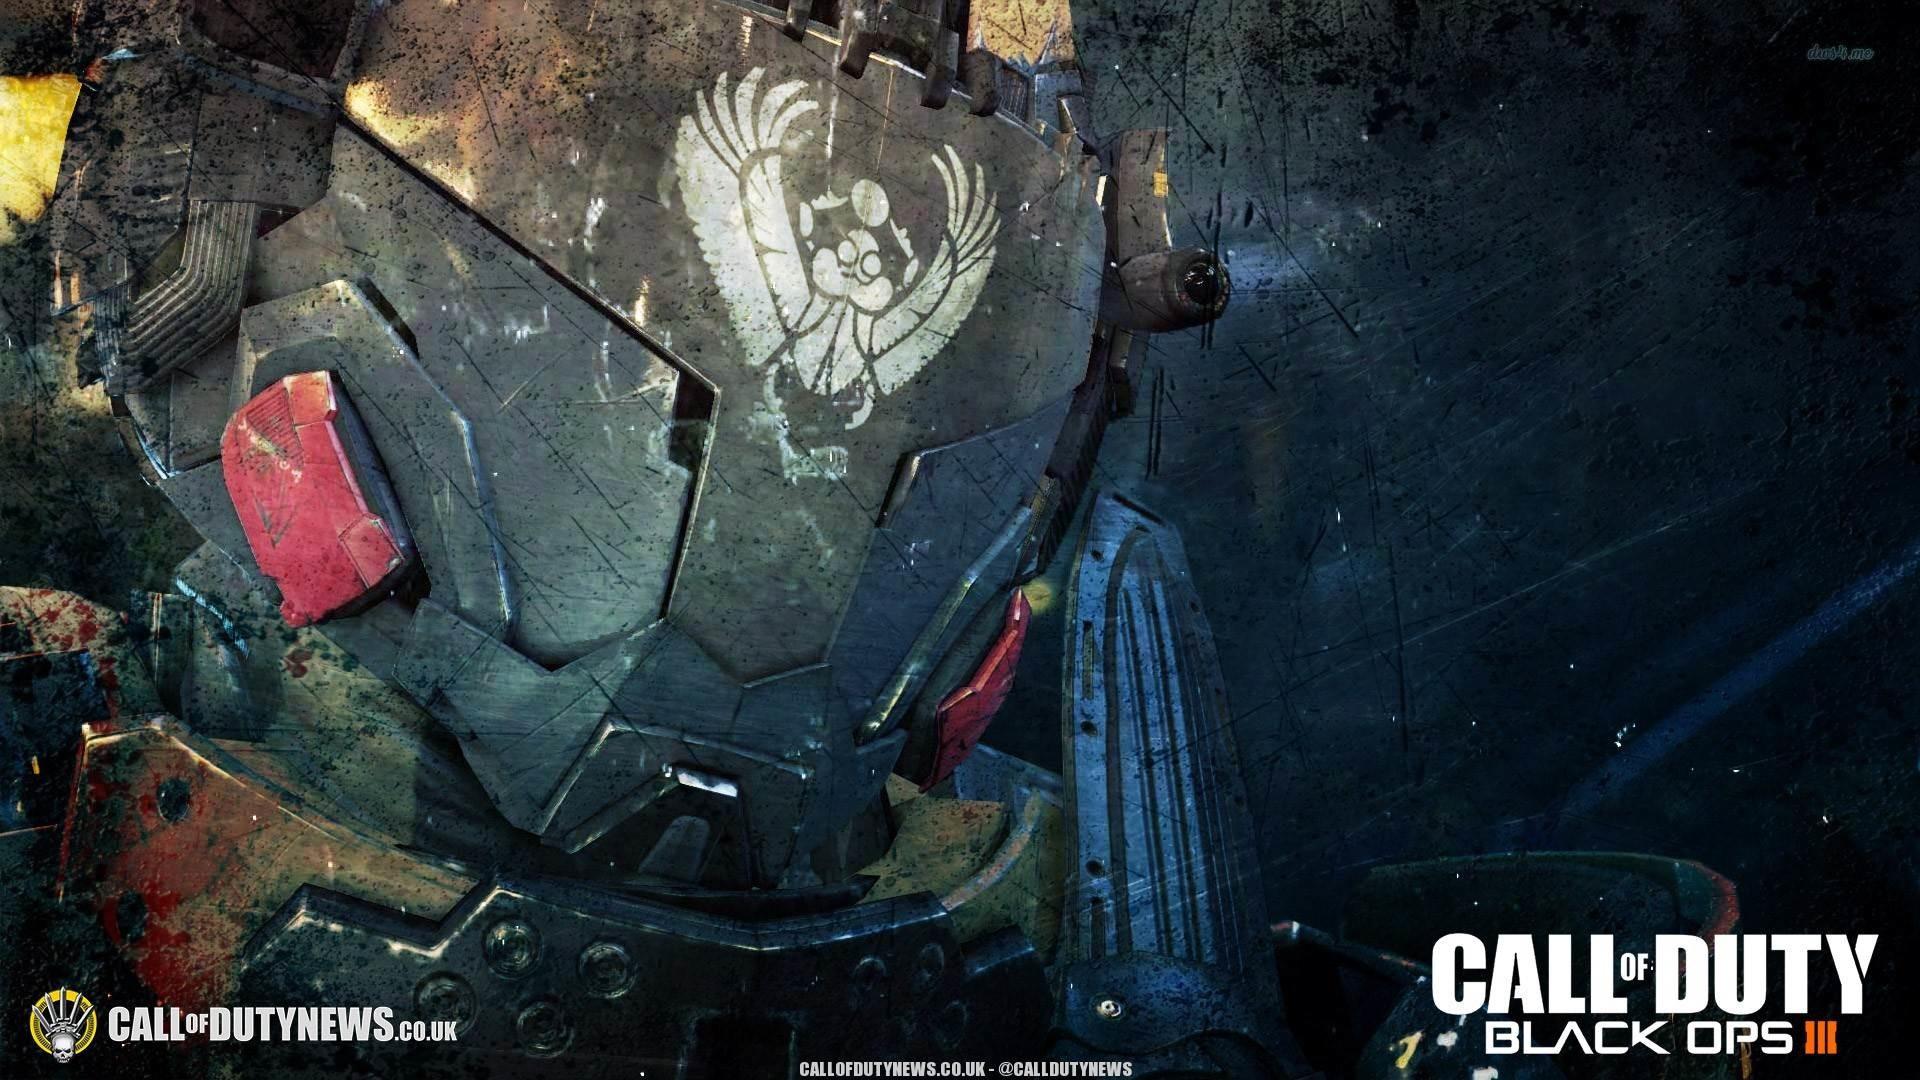 WallpapersWidecom Call Of Duty HD Desktop Wallpapers